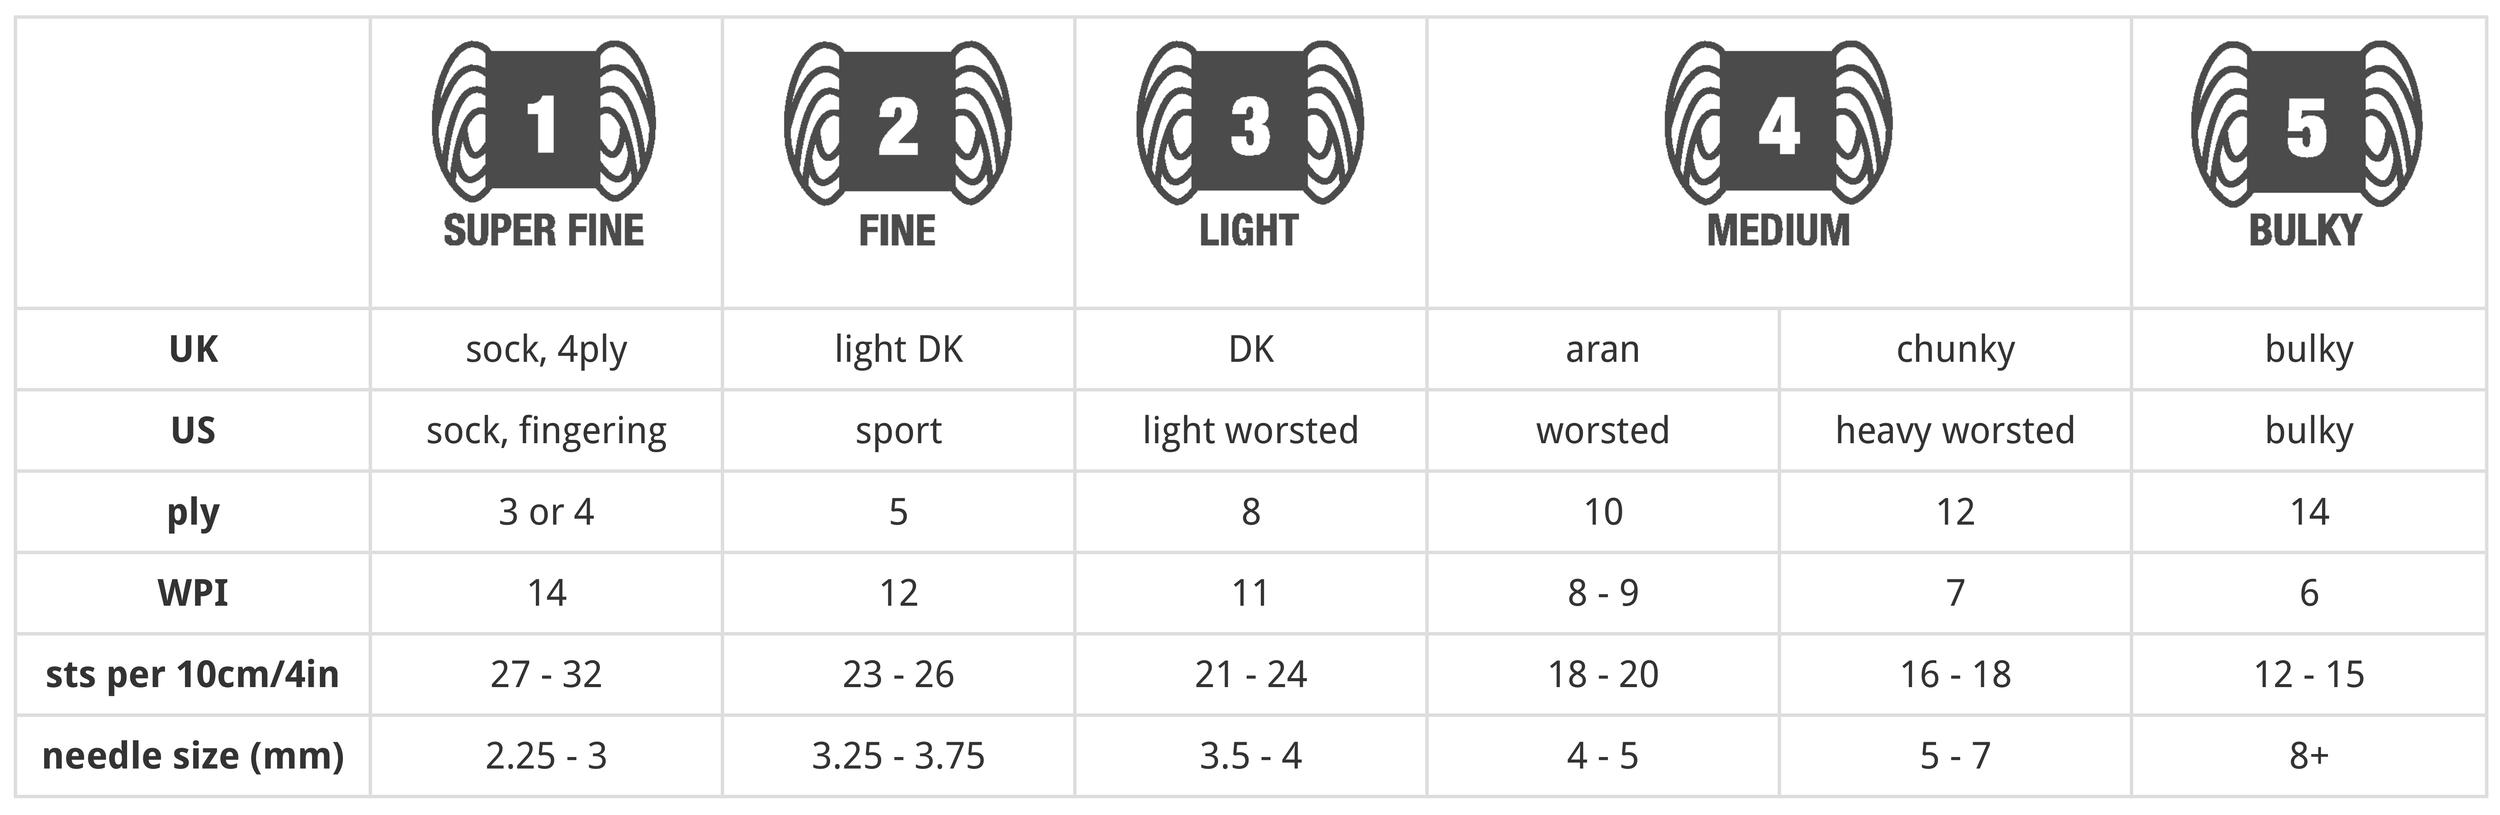 Woolly Wormhead yarn weight comparison chart